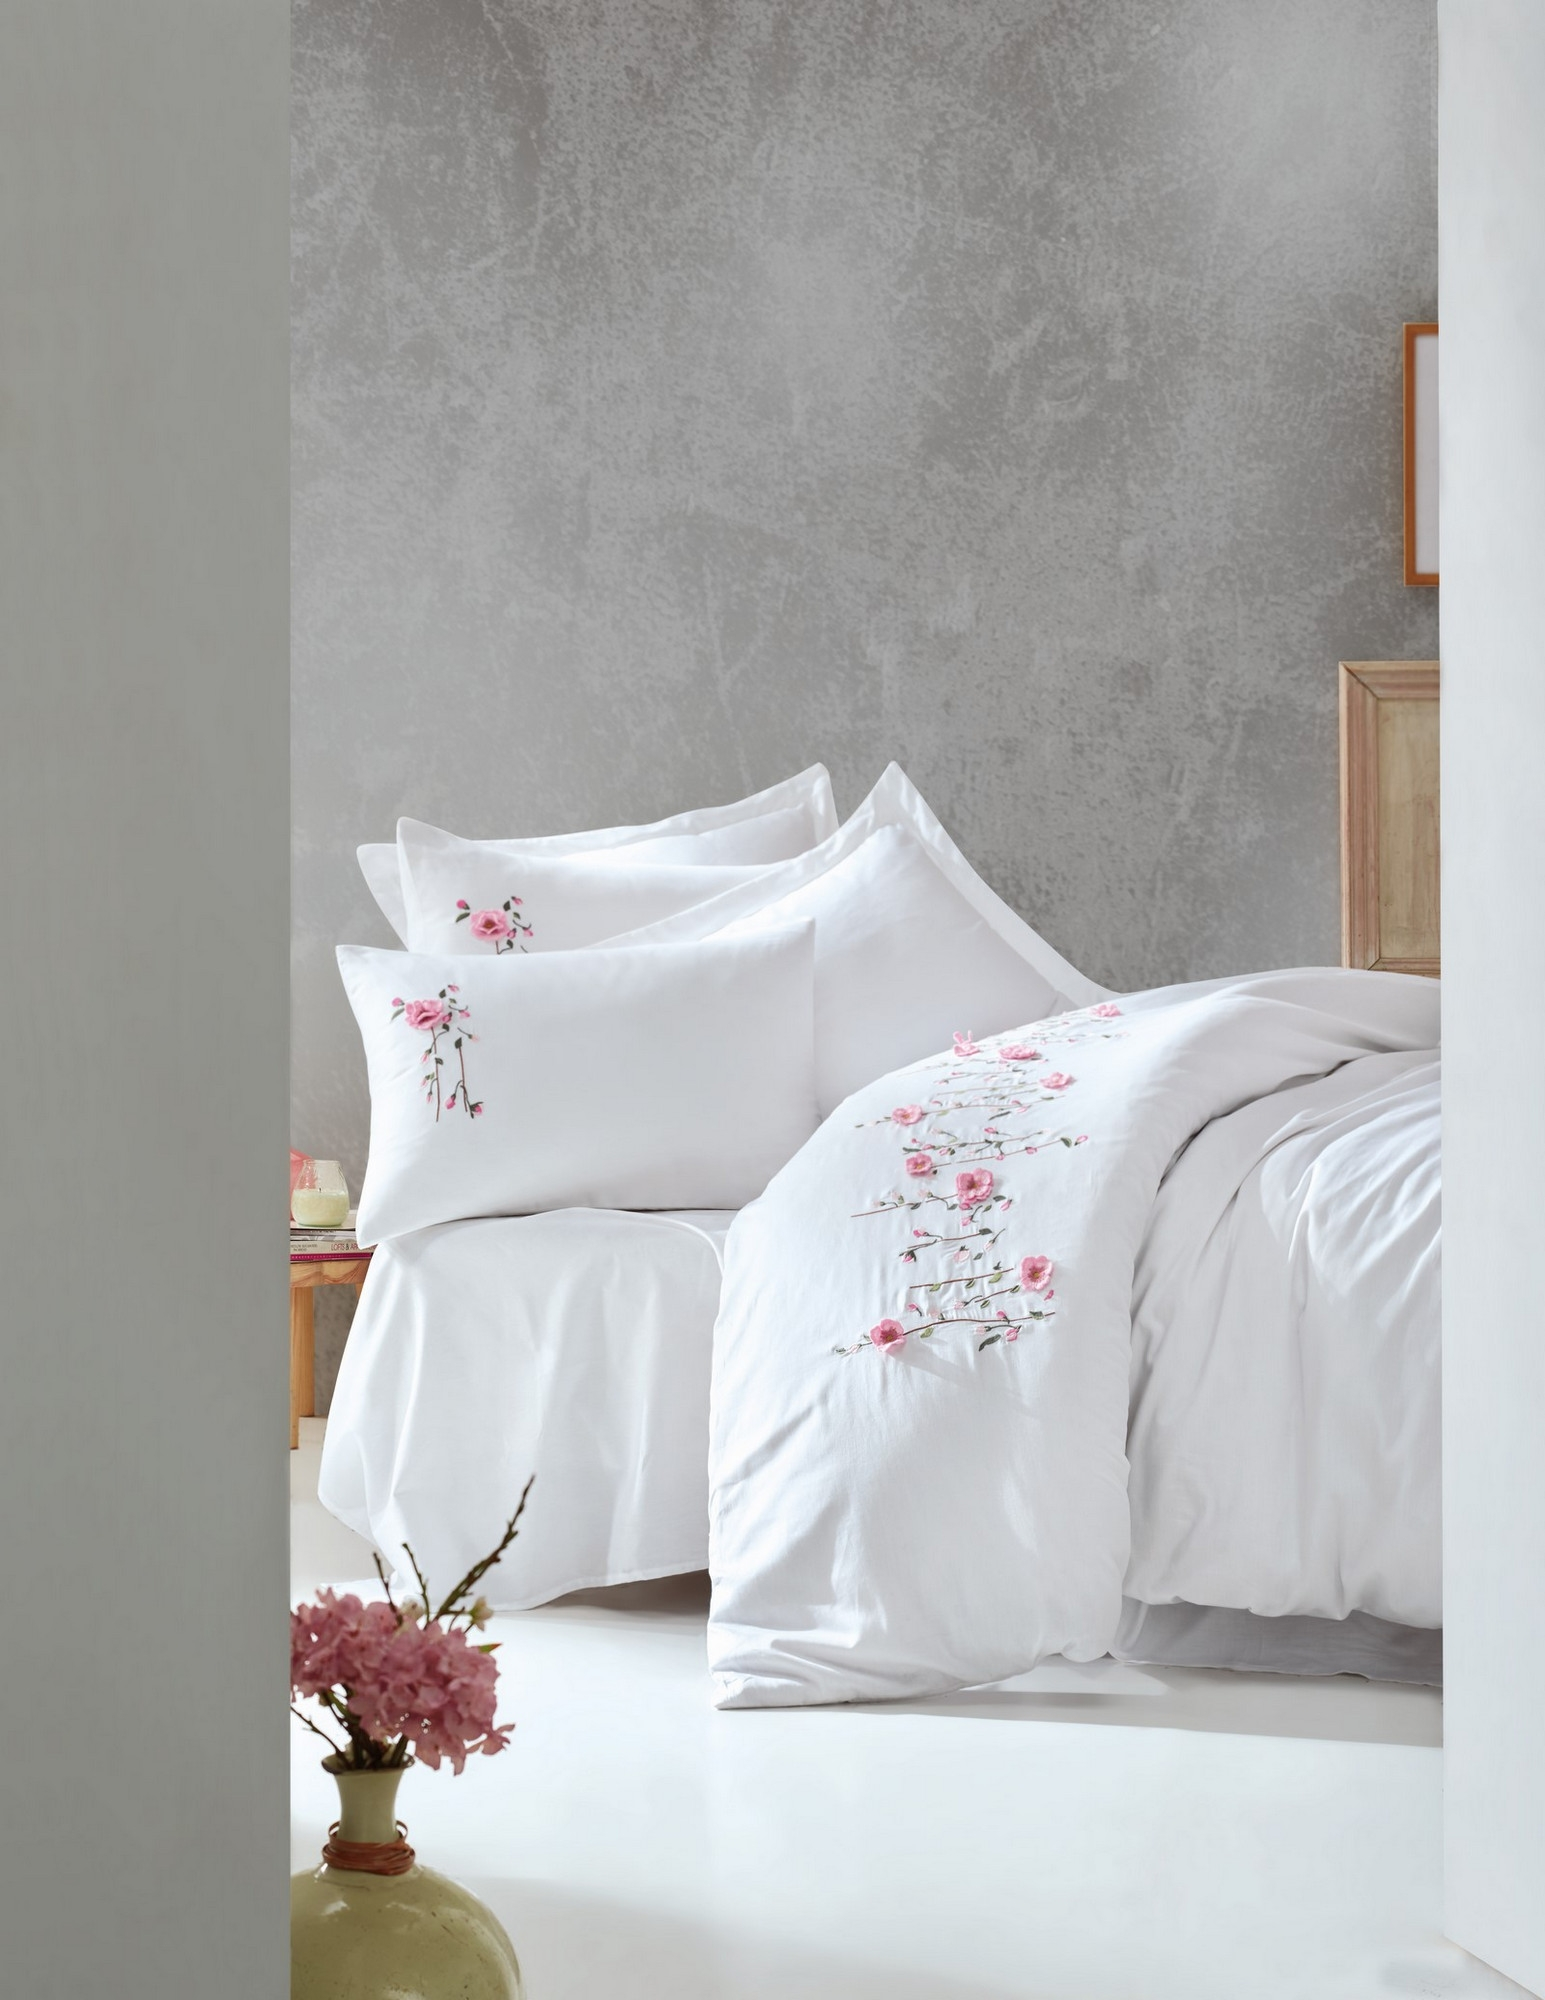 Lenjerie de pat din bumbac Satinat Premium Perla Alb / Roz, 200 x 220 cm